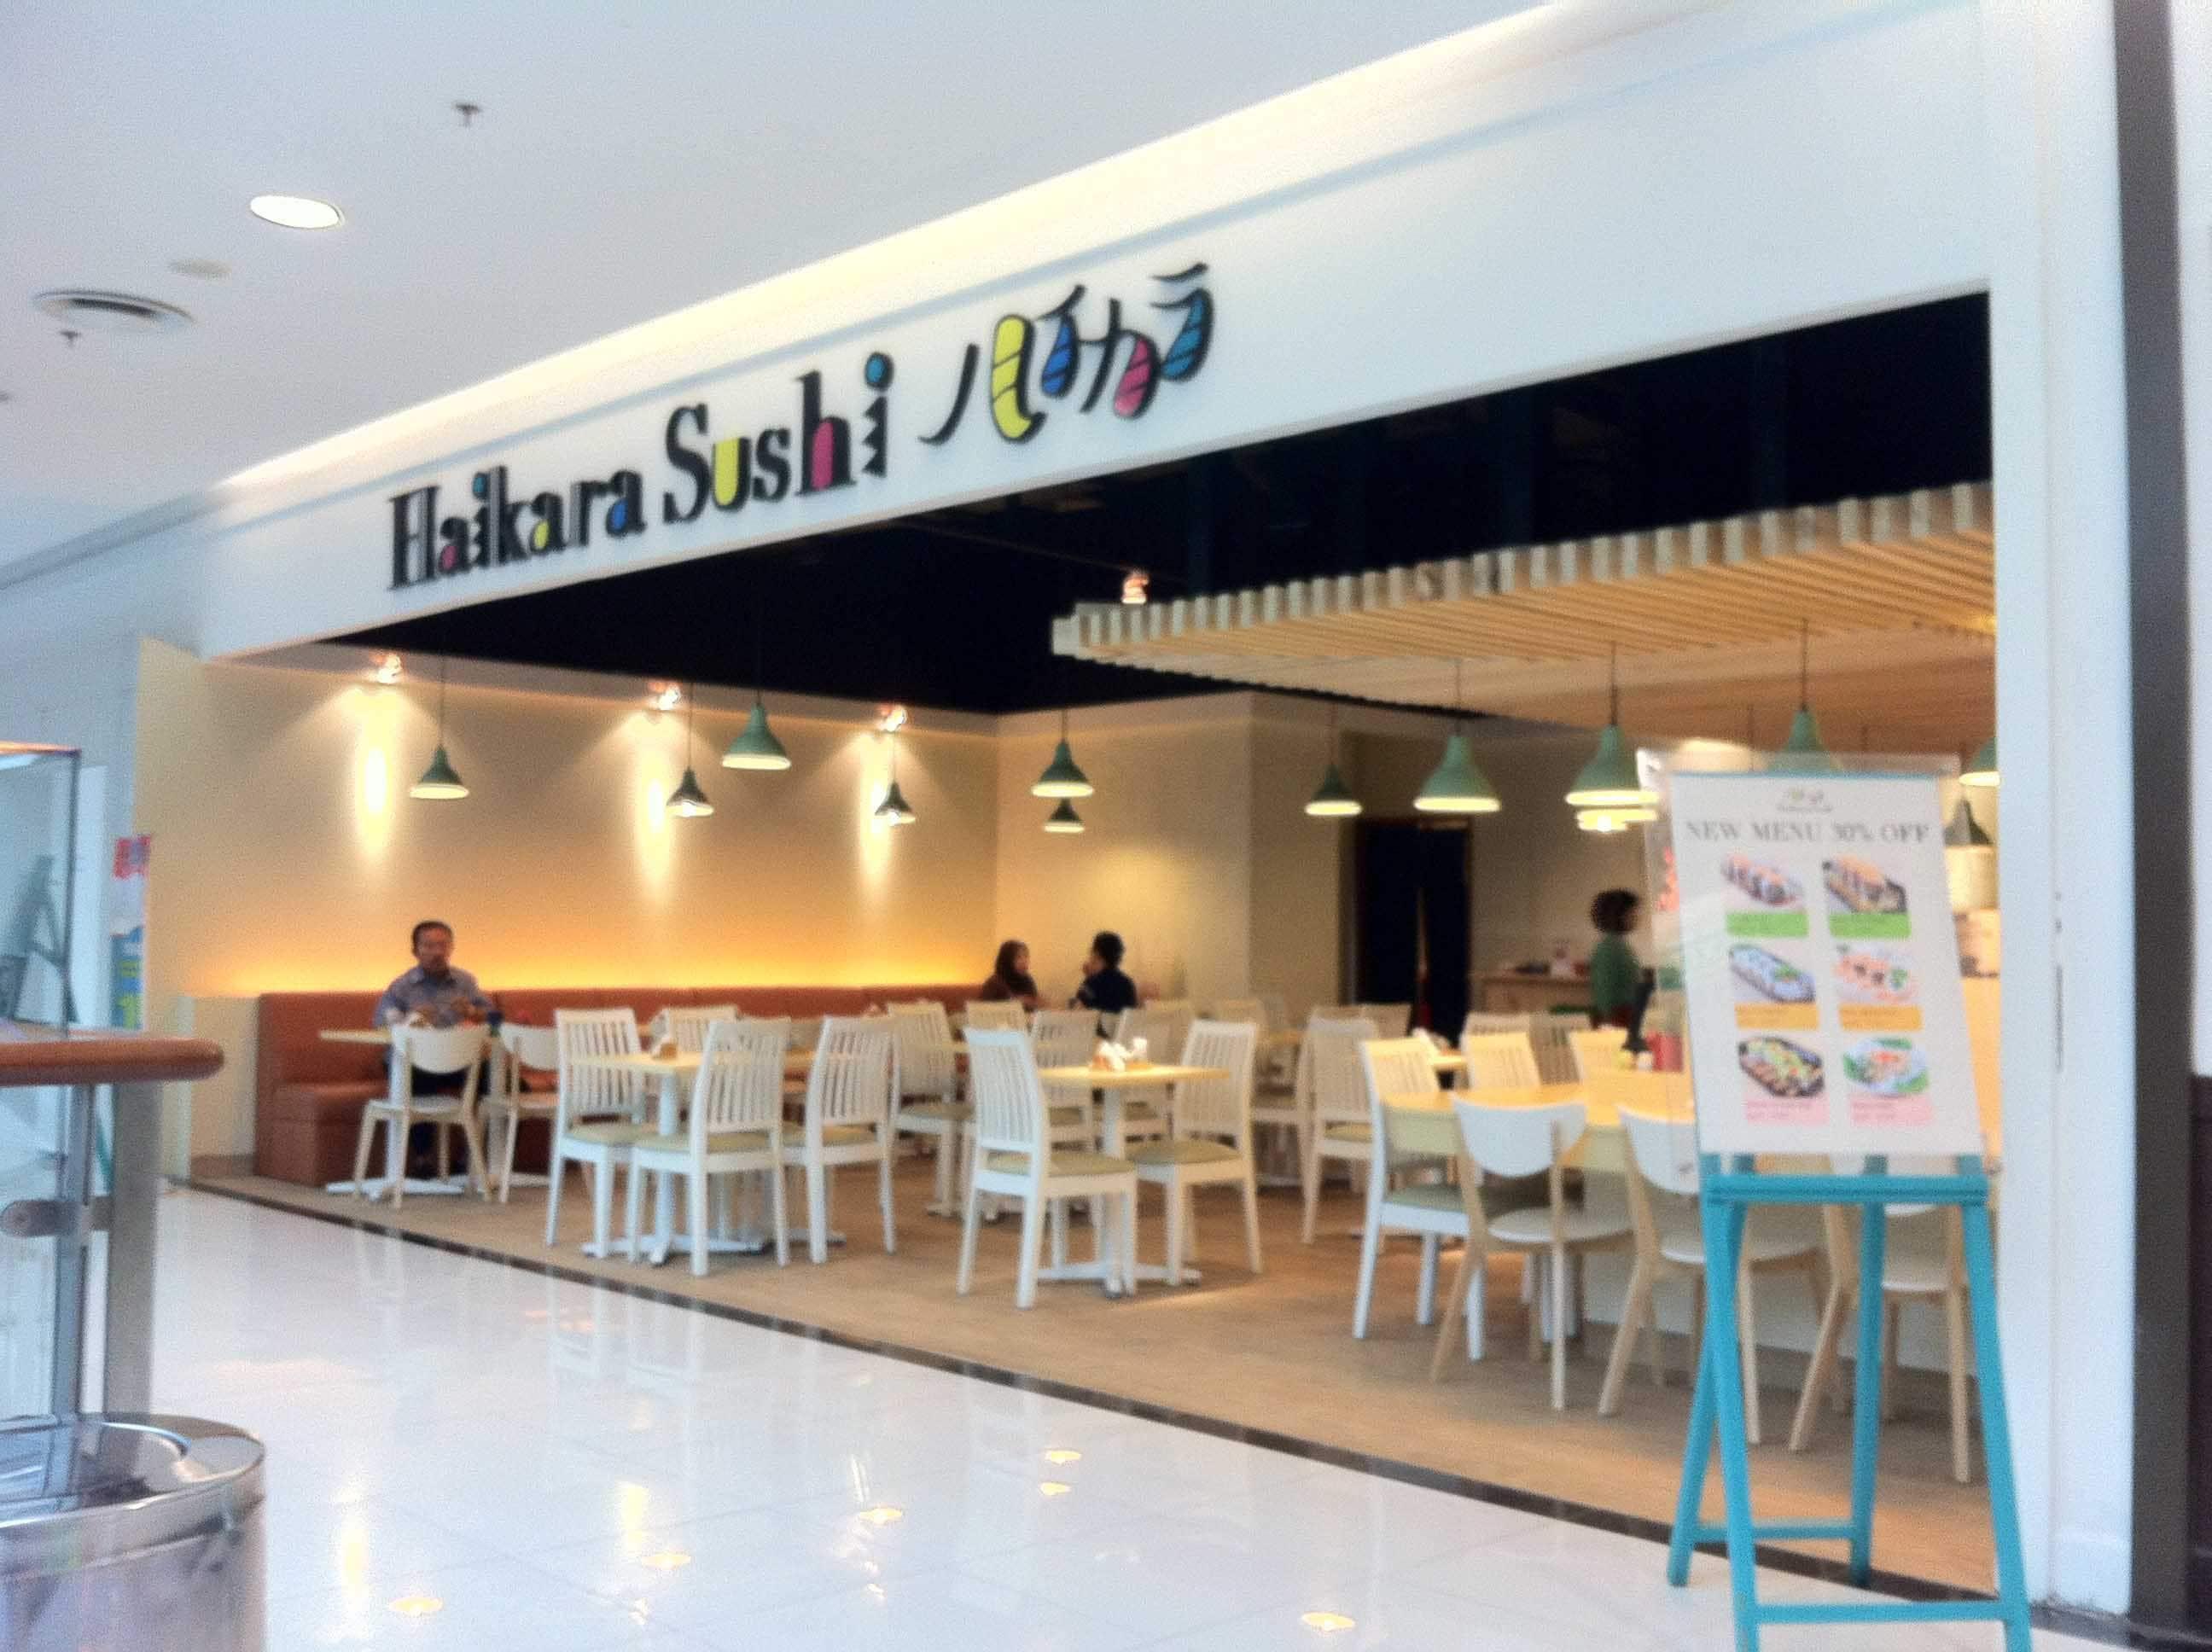 Recommendation Haikara Sushi Lotte Mall Bintaro Nadia Rachmawati